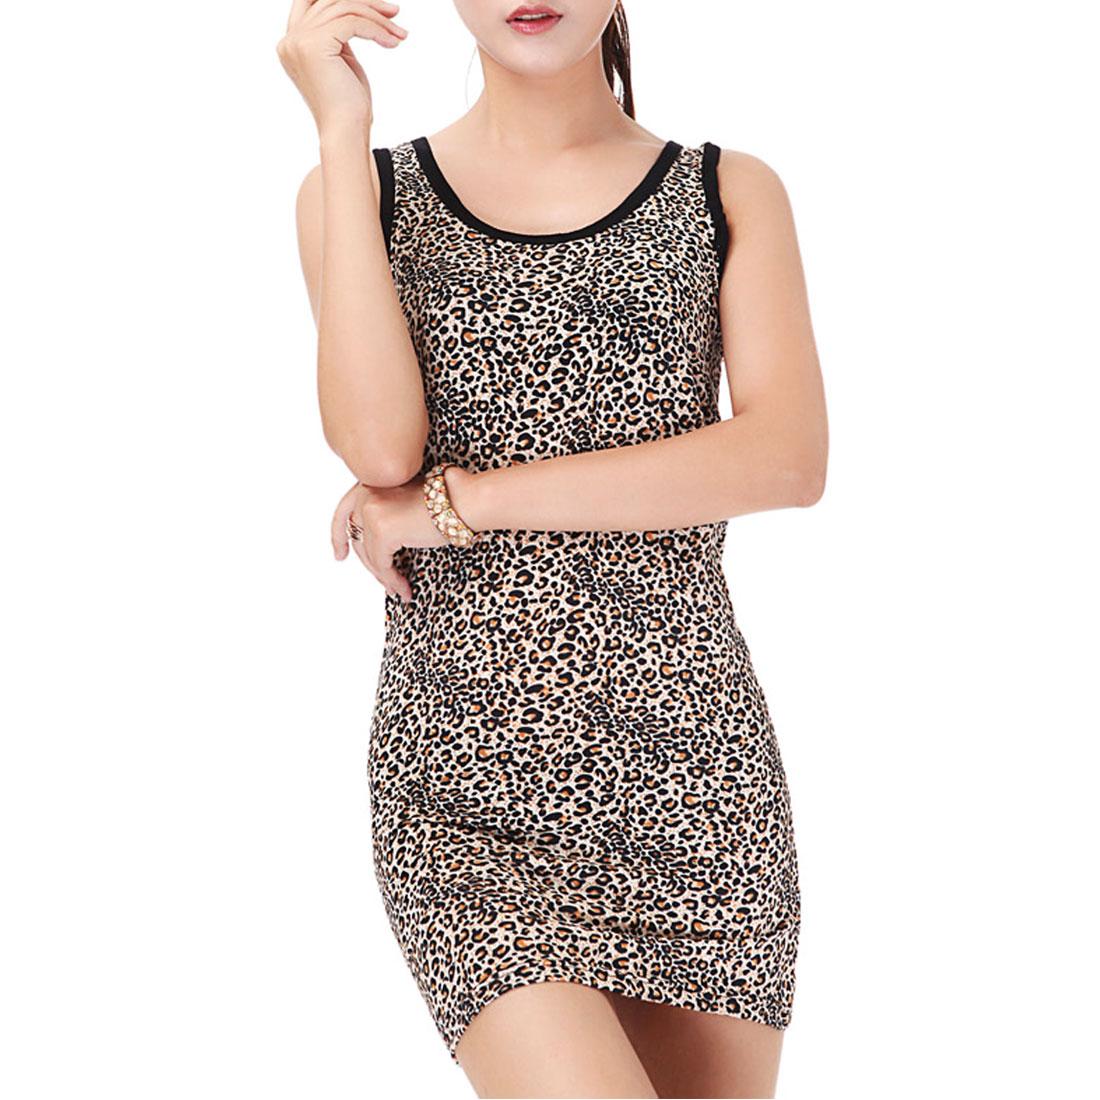 Woman Leopard Pattern Stretch Closefitting Racer Back Tank Top Black Brown XS